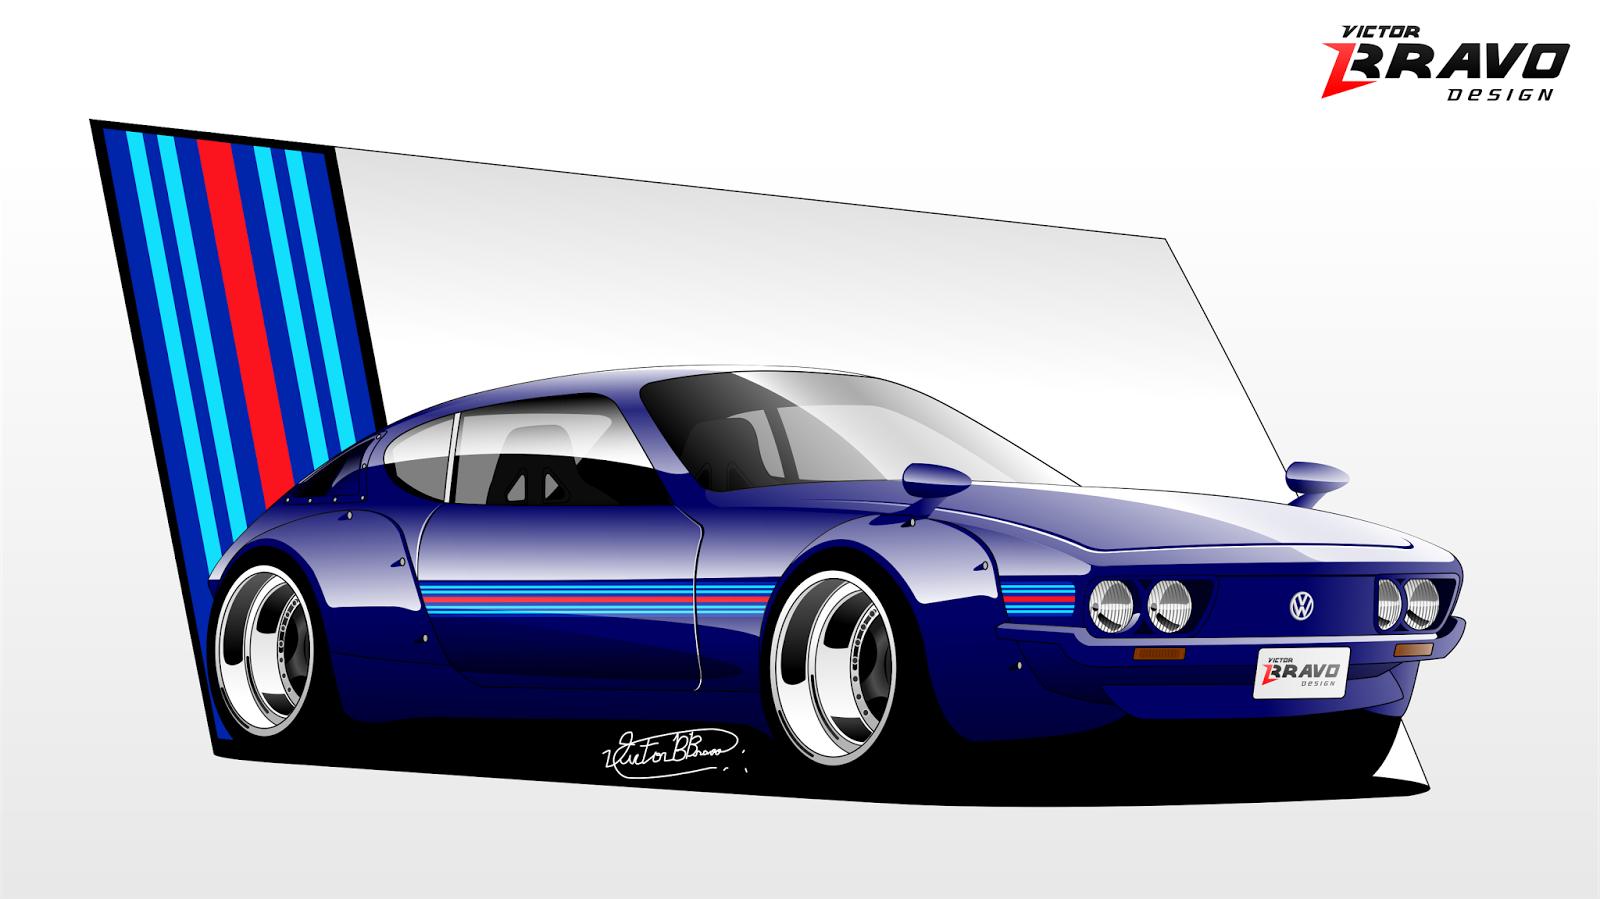 Volkswagen SP2 inspirado no visual dos Porsche RWB.